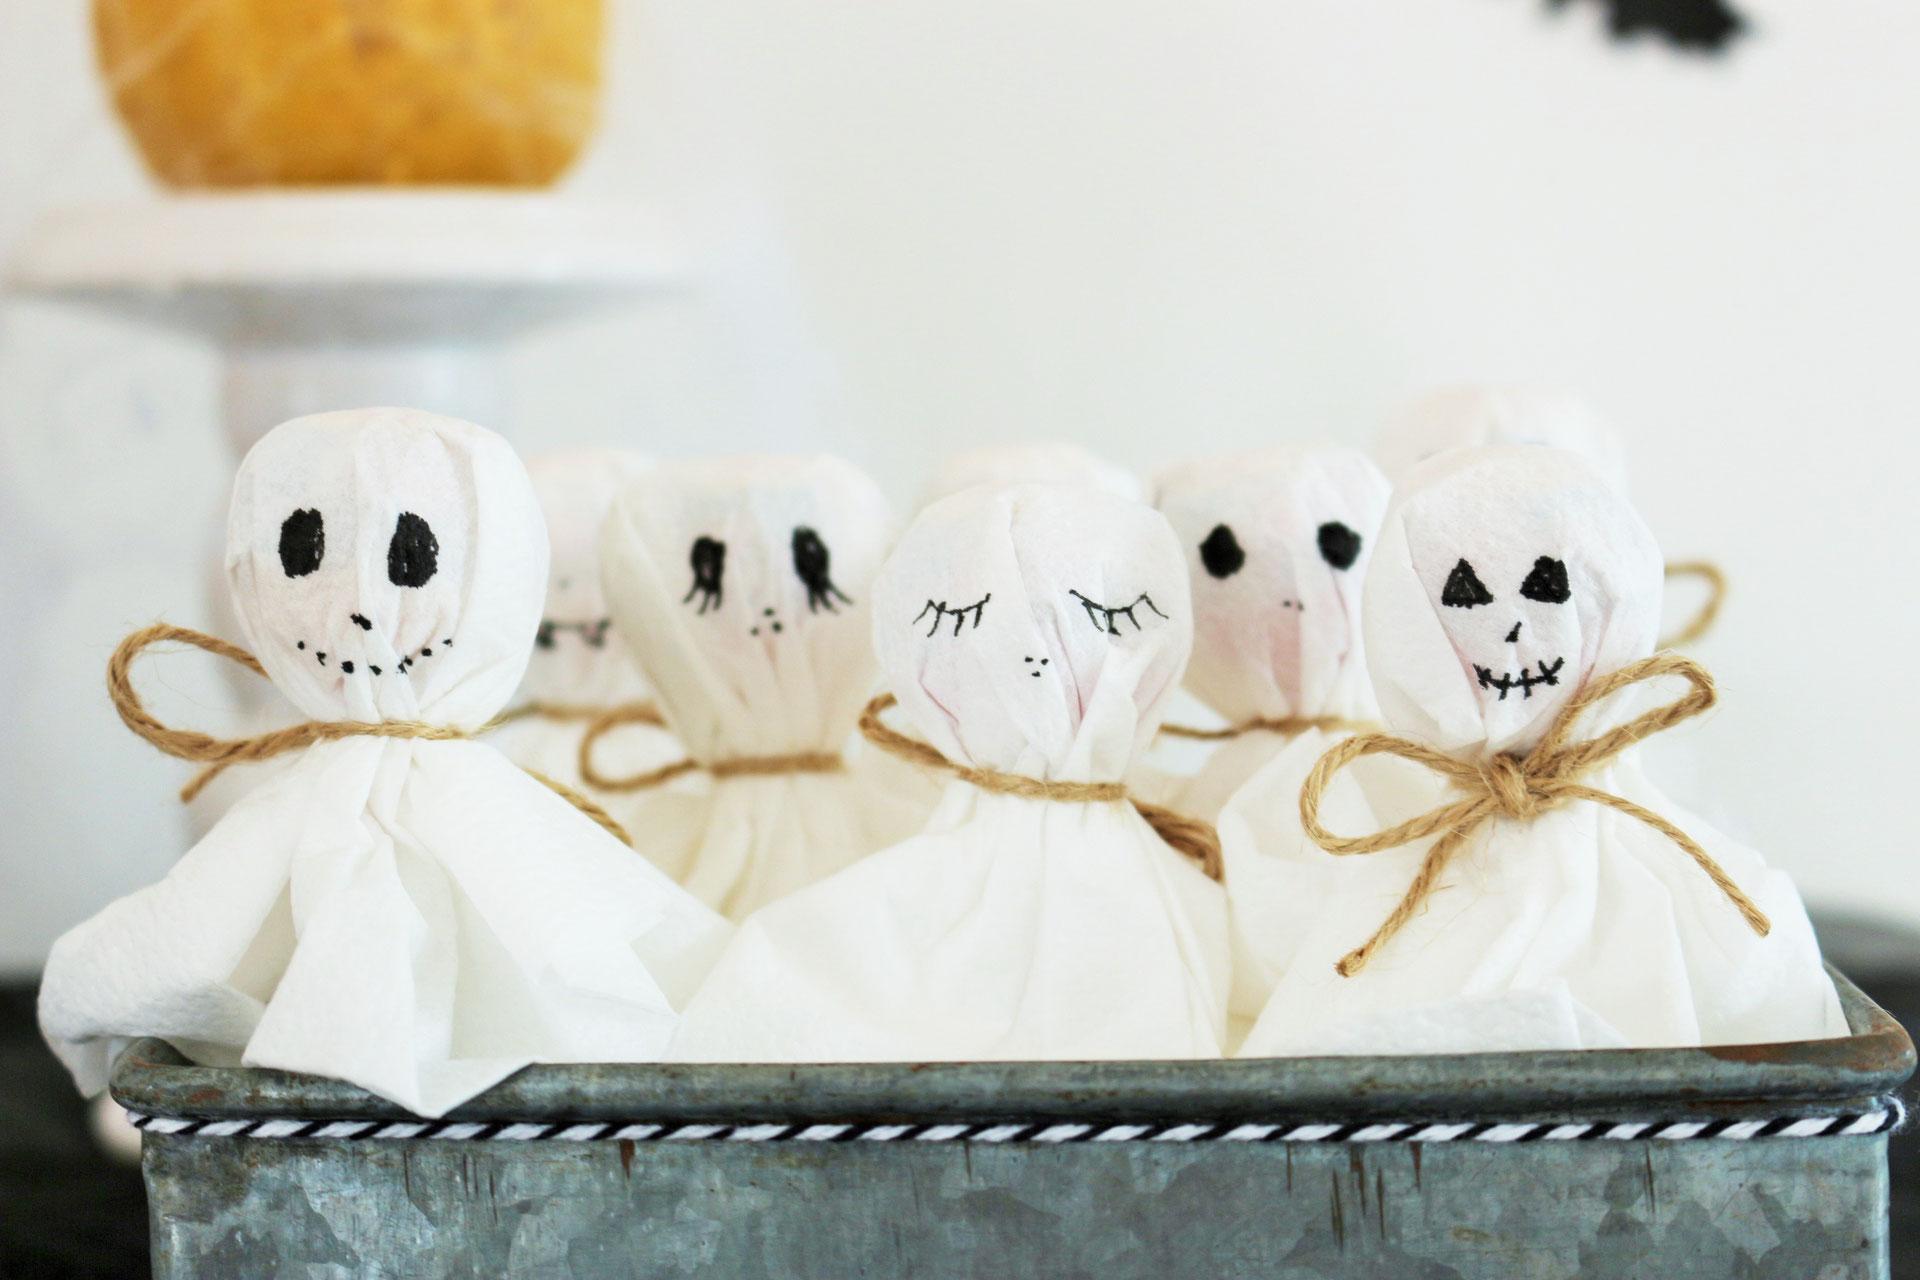 DIY Halloween Süßigkeiten Verpackung: Als Geist - Partystories Blog